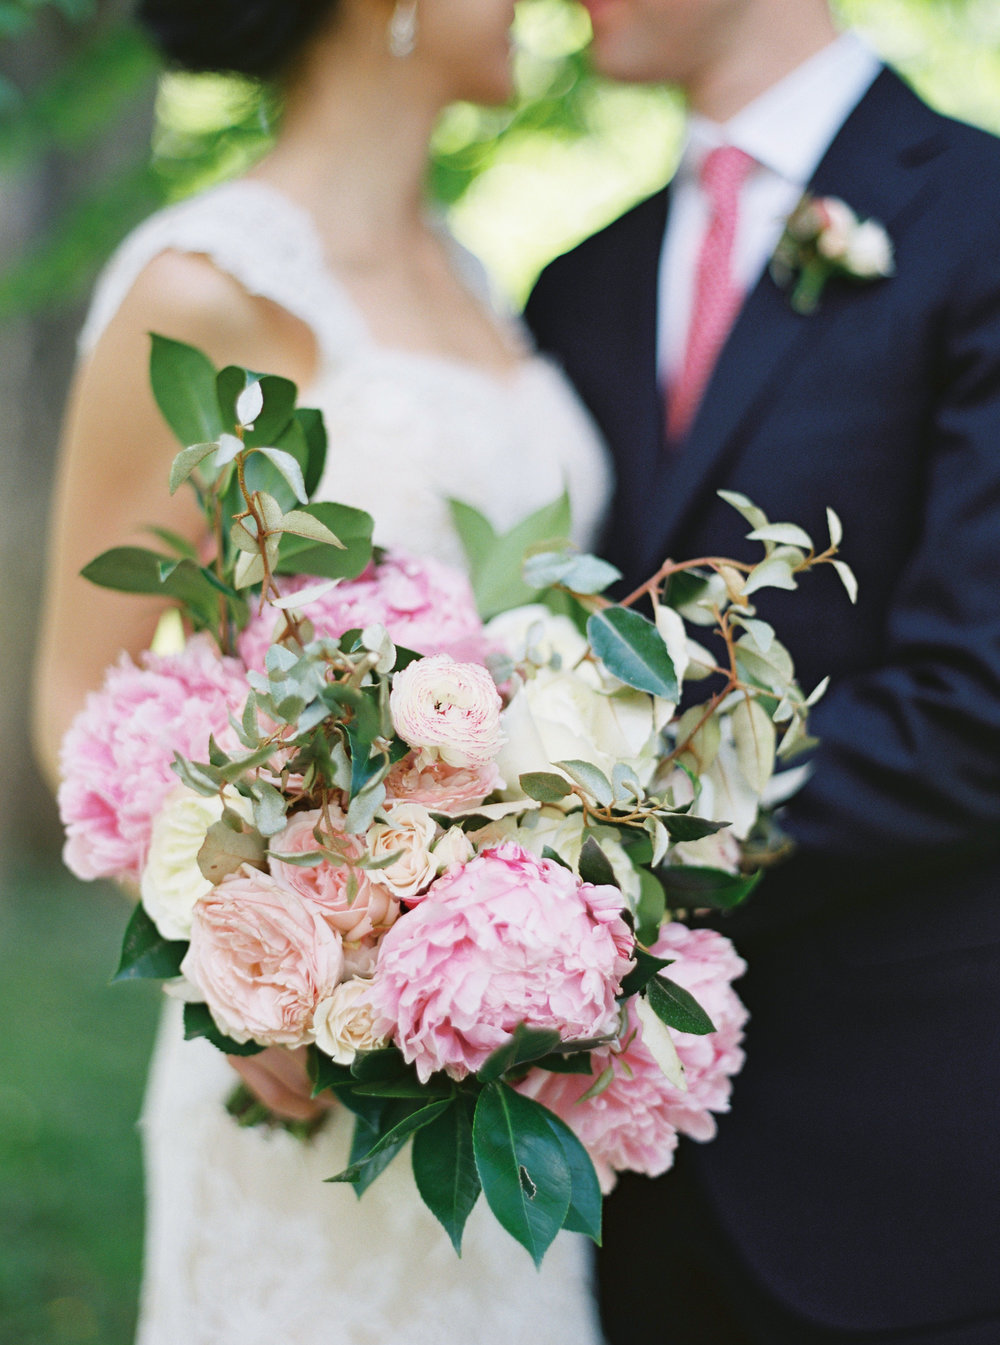 amelia_johnson_photography_laura&henry_wedding00092.jpg